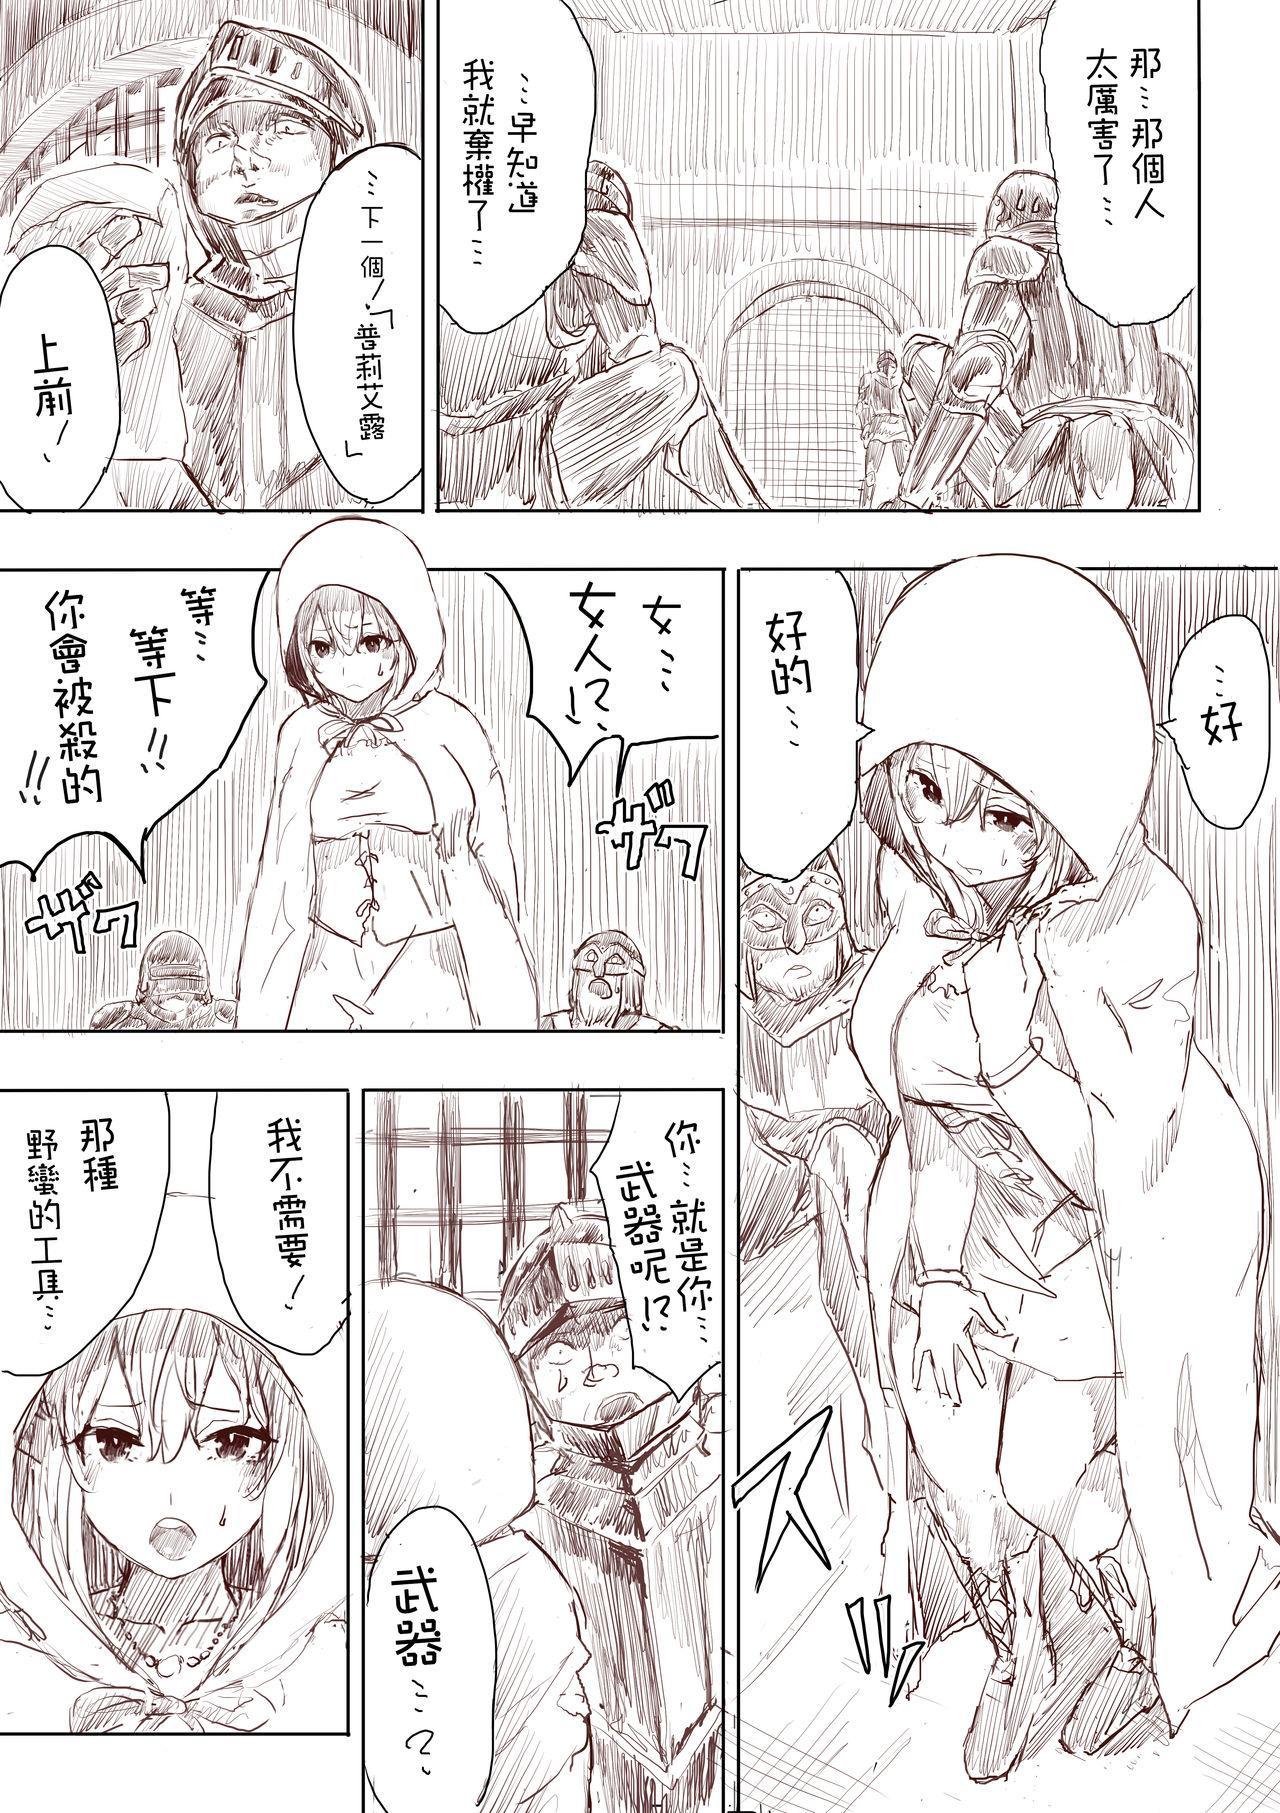 Elf Princess Strikes Back Part1 4